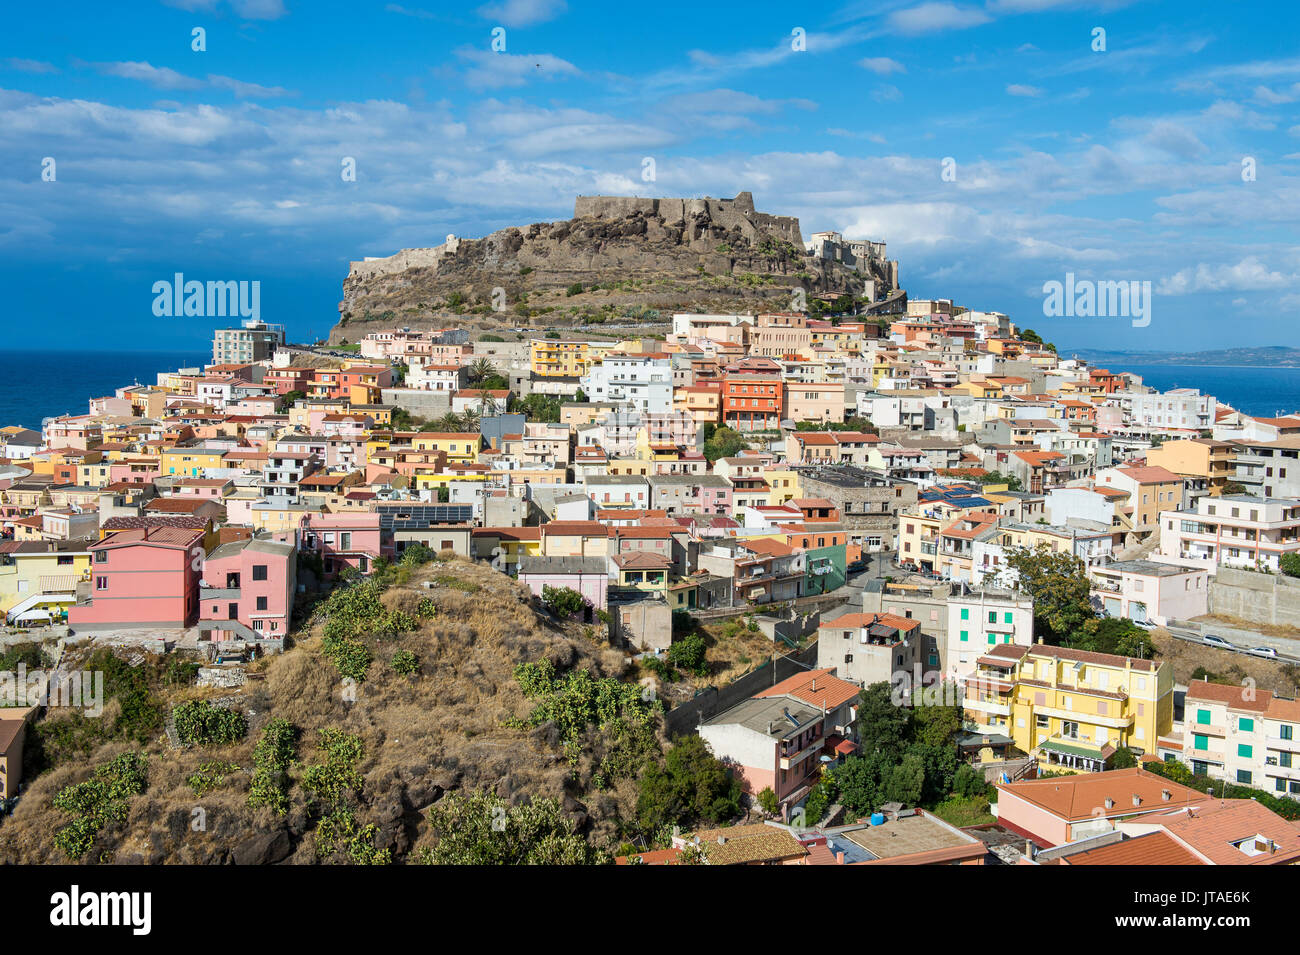 Vistas de Castelsardo, Cerdeña, Italia, Mediterráneo, Europa Imagen De Stock